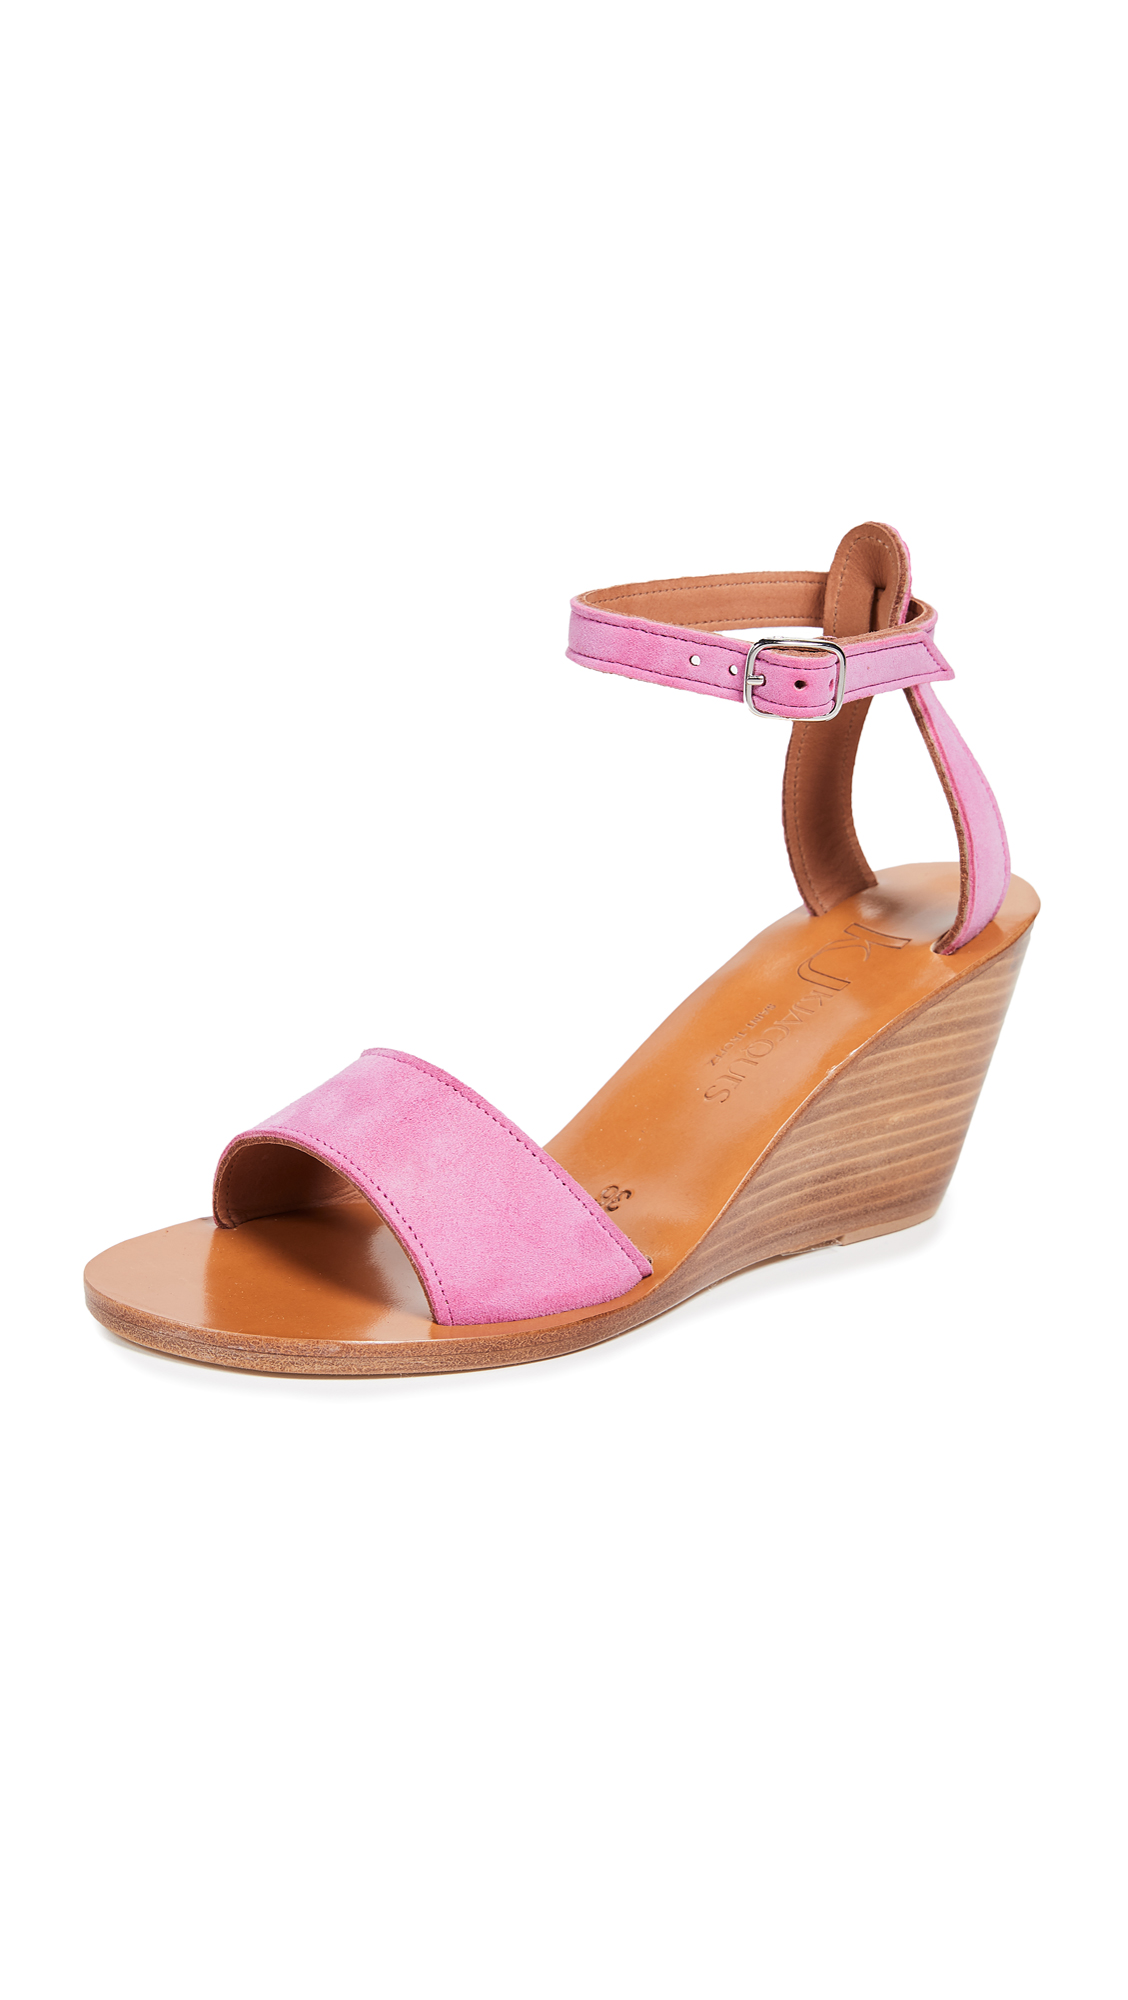 K. Jacques Sardaigne Wedge Sandals - Velours Bogor